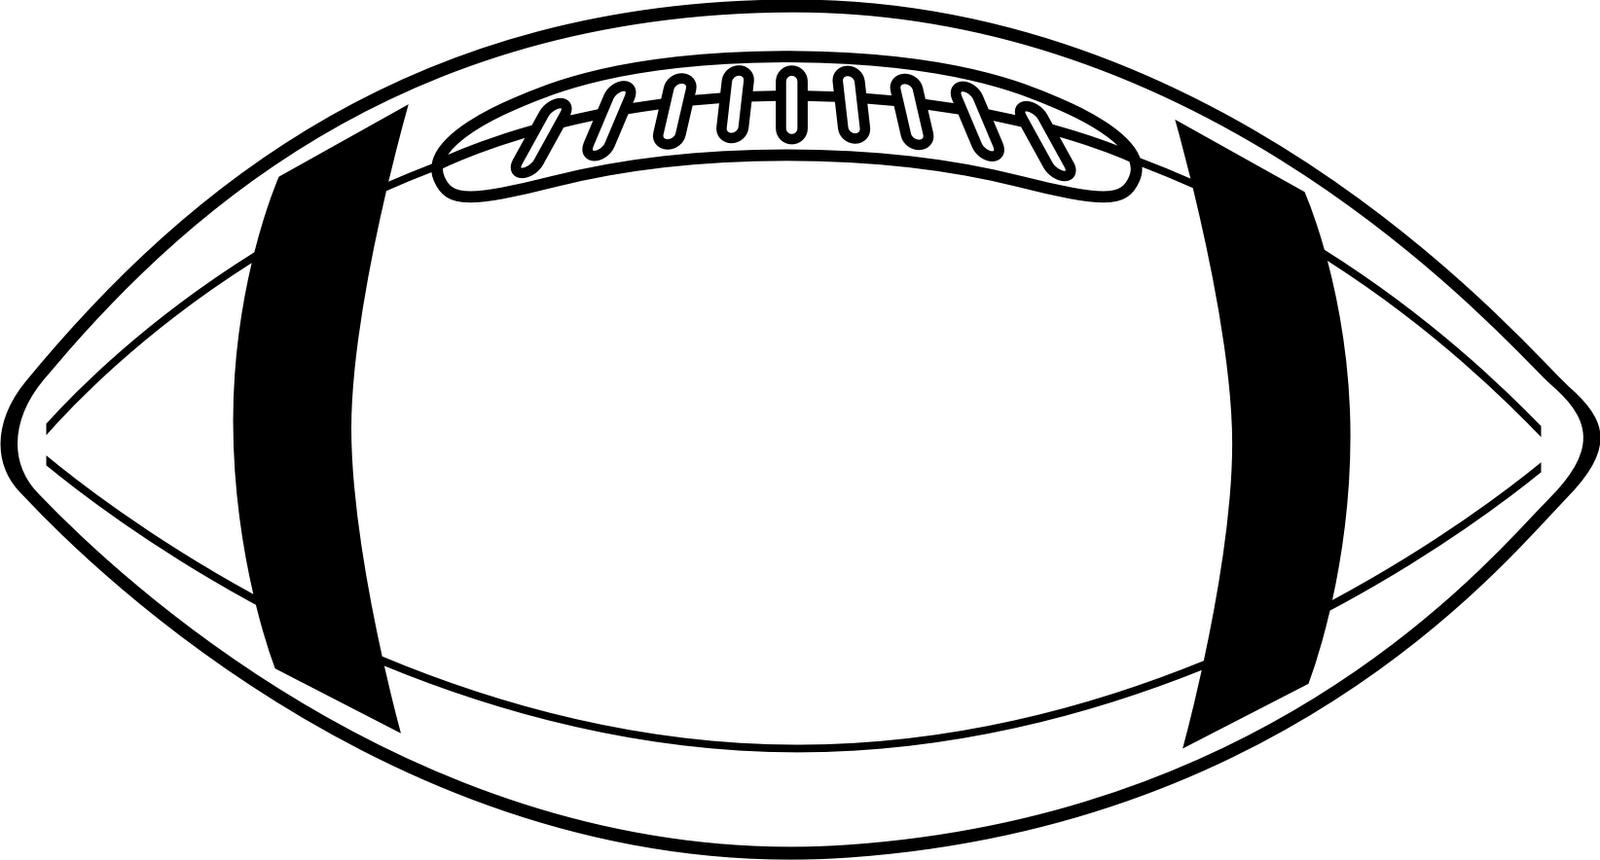 1600x860 Flag football clipart free download clip art 3